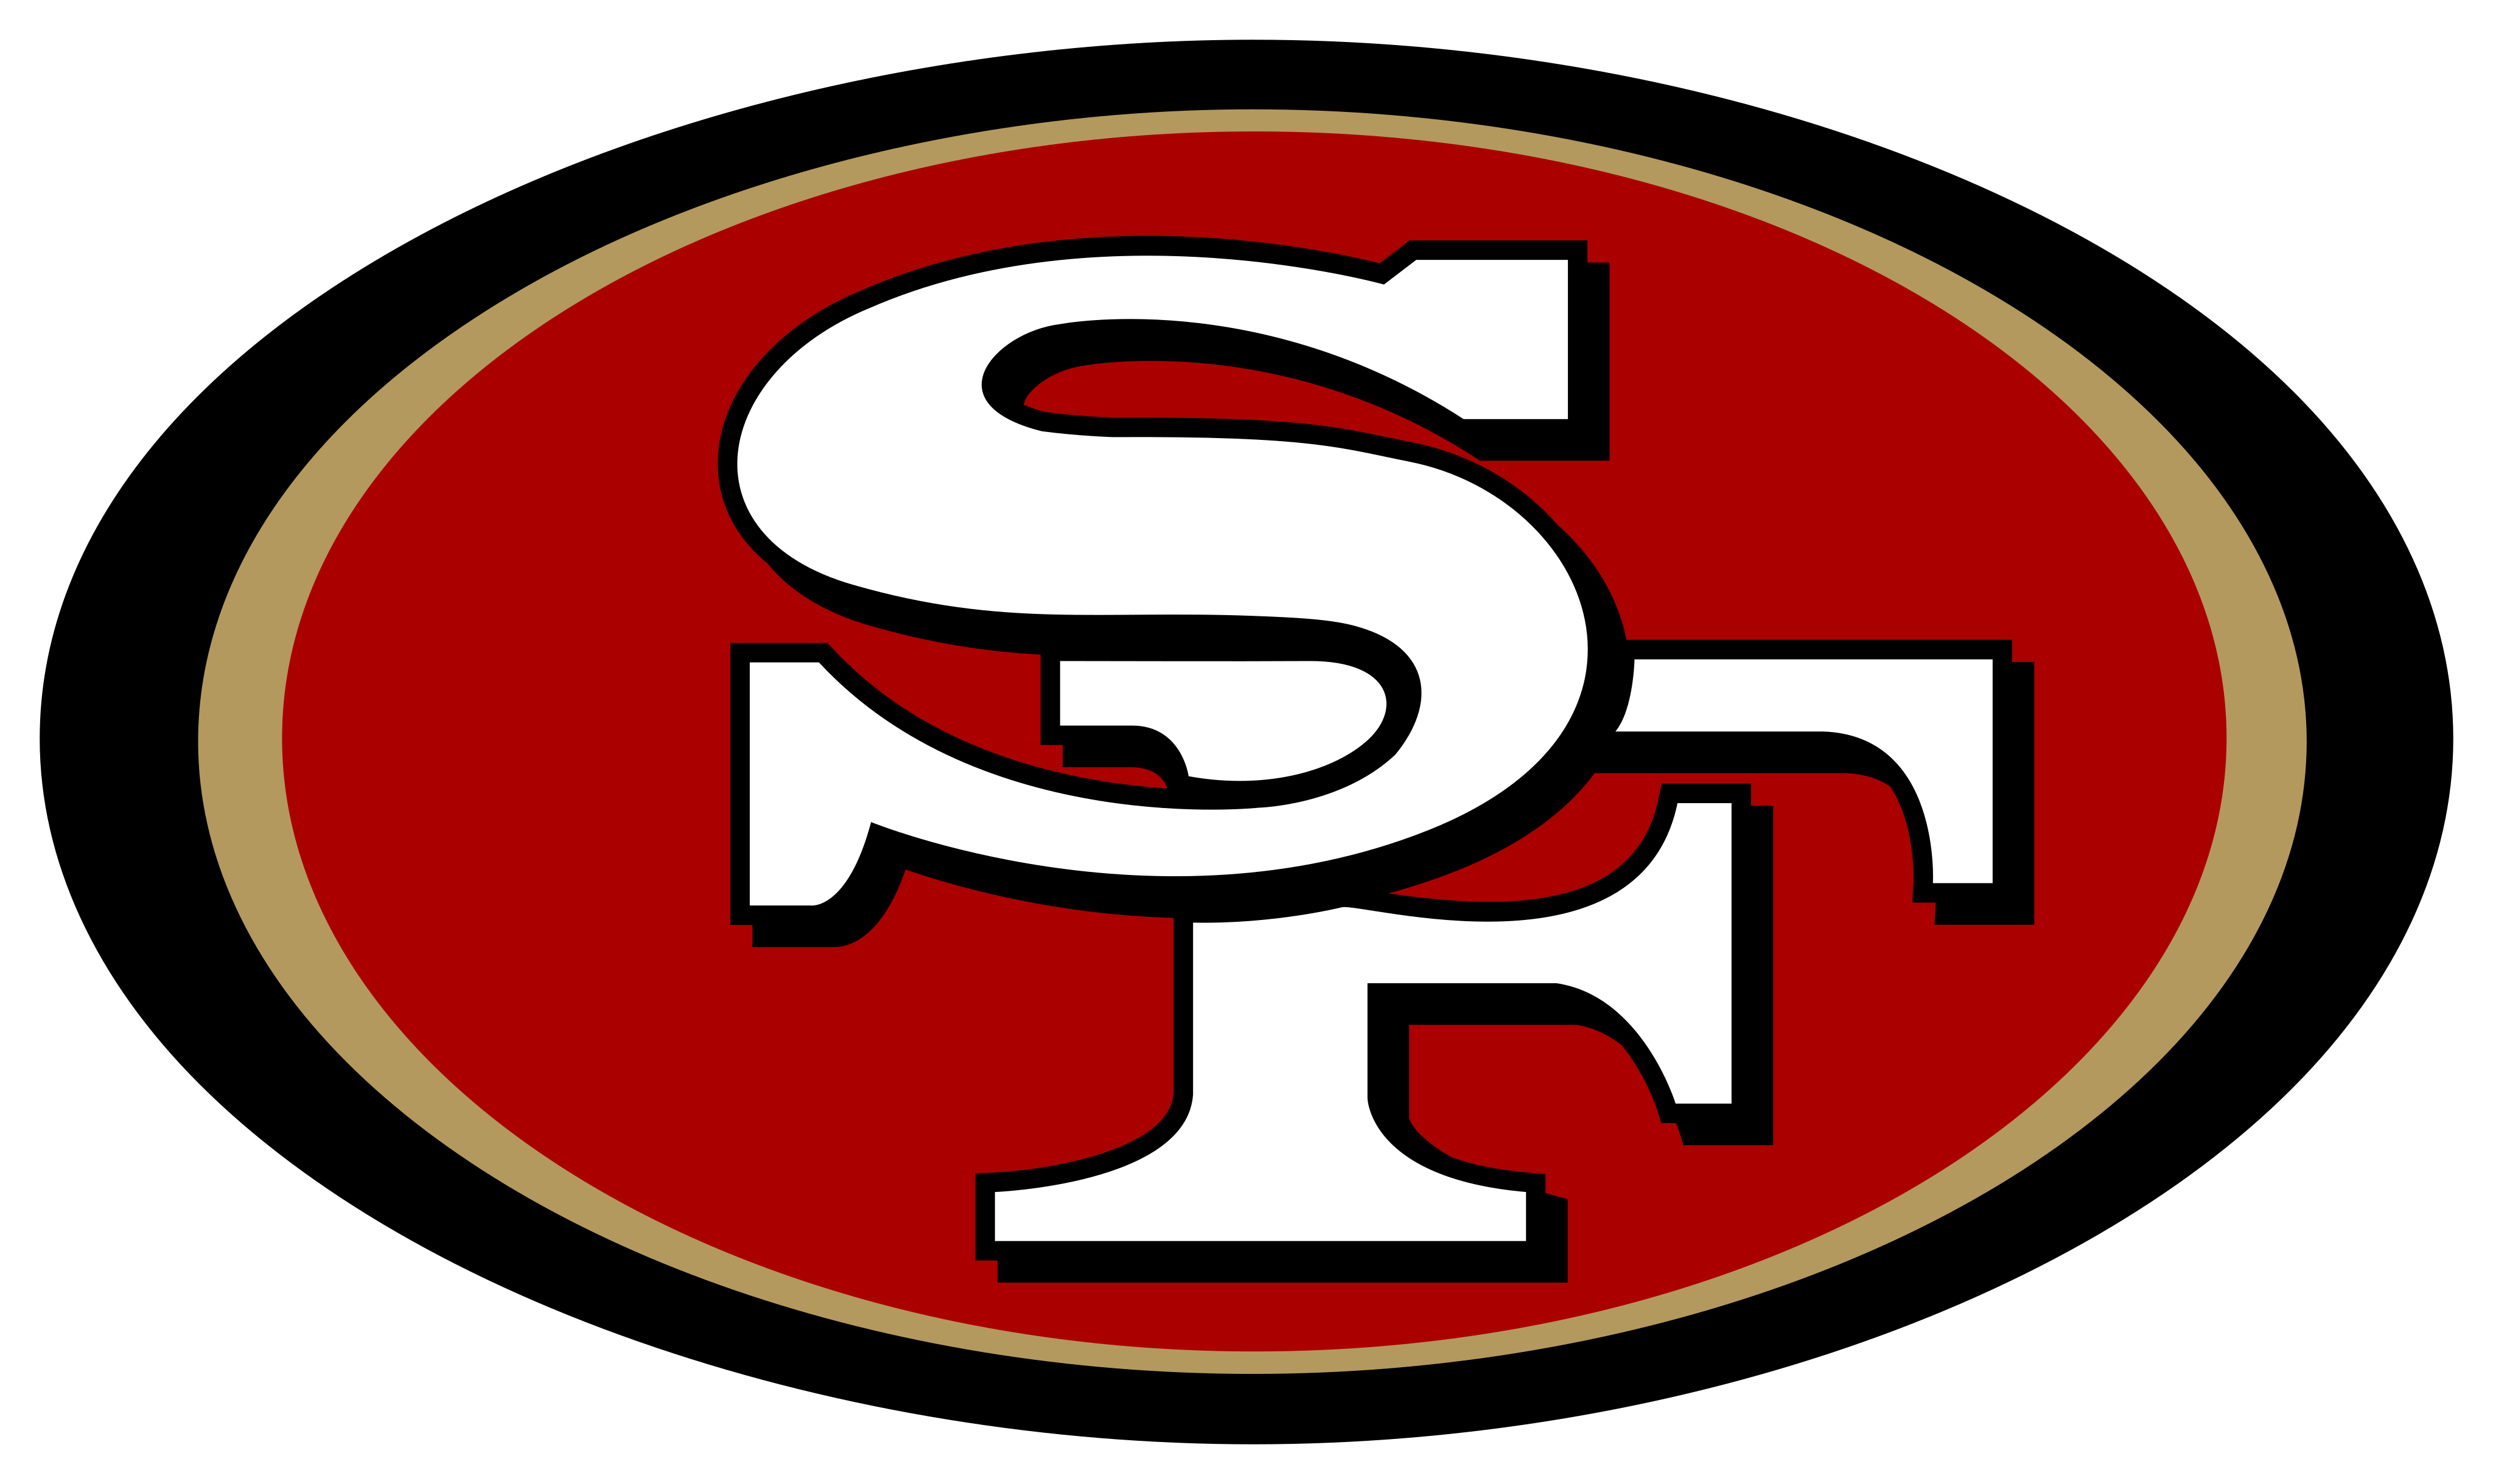 san francisco 49ers logo - San Francisco 49ers Logo